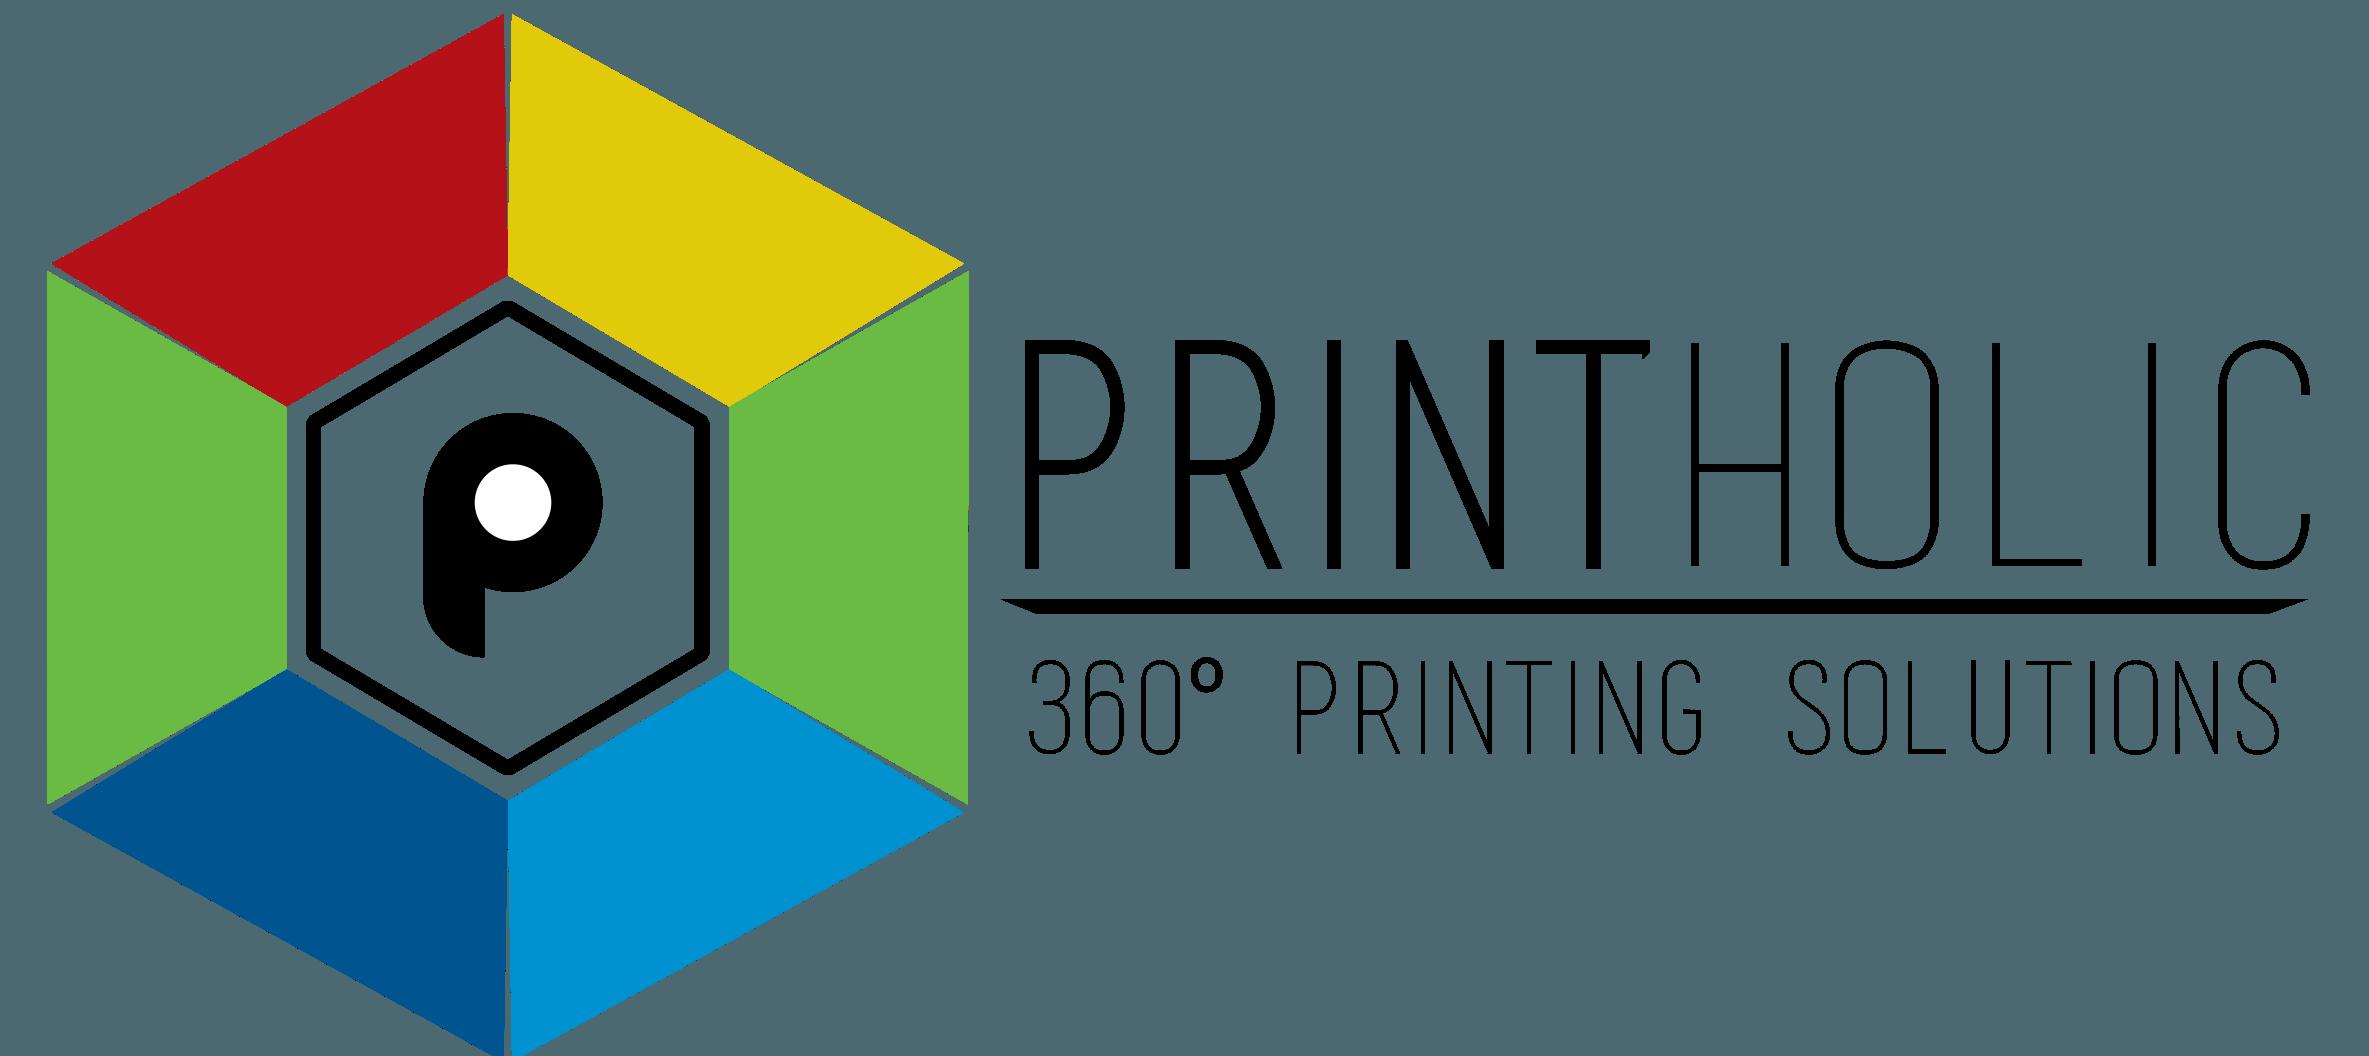 Printing Press Logo.